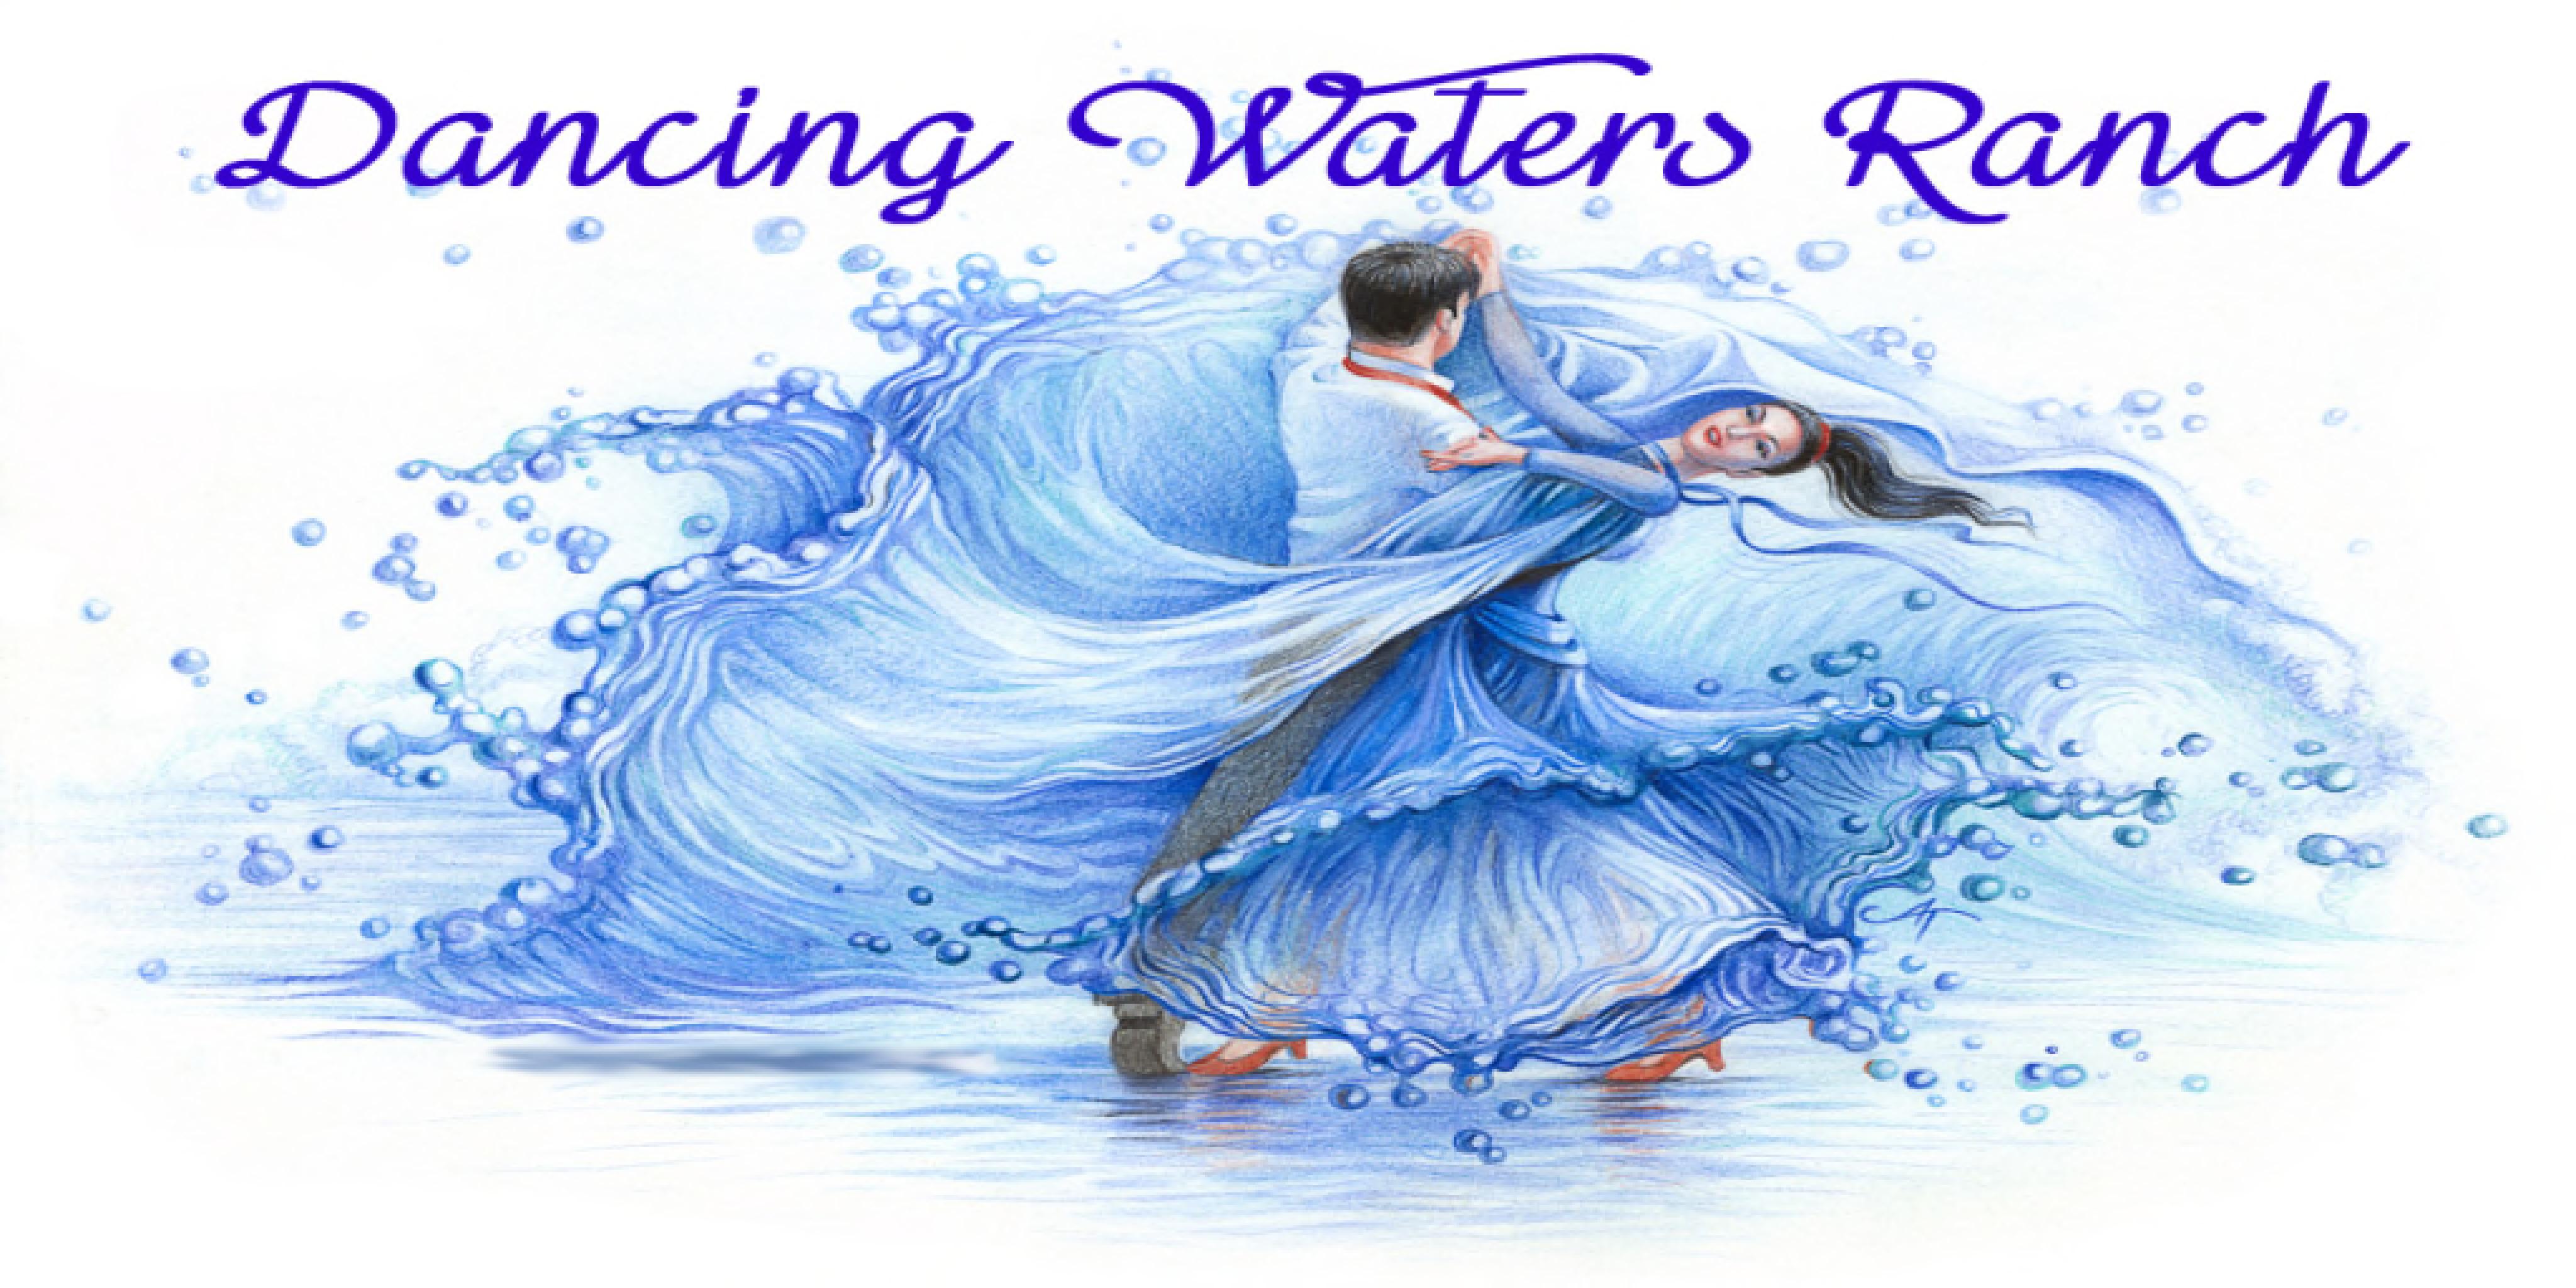 *~Dancing Water Ranch~*